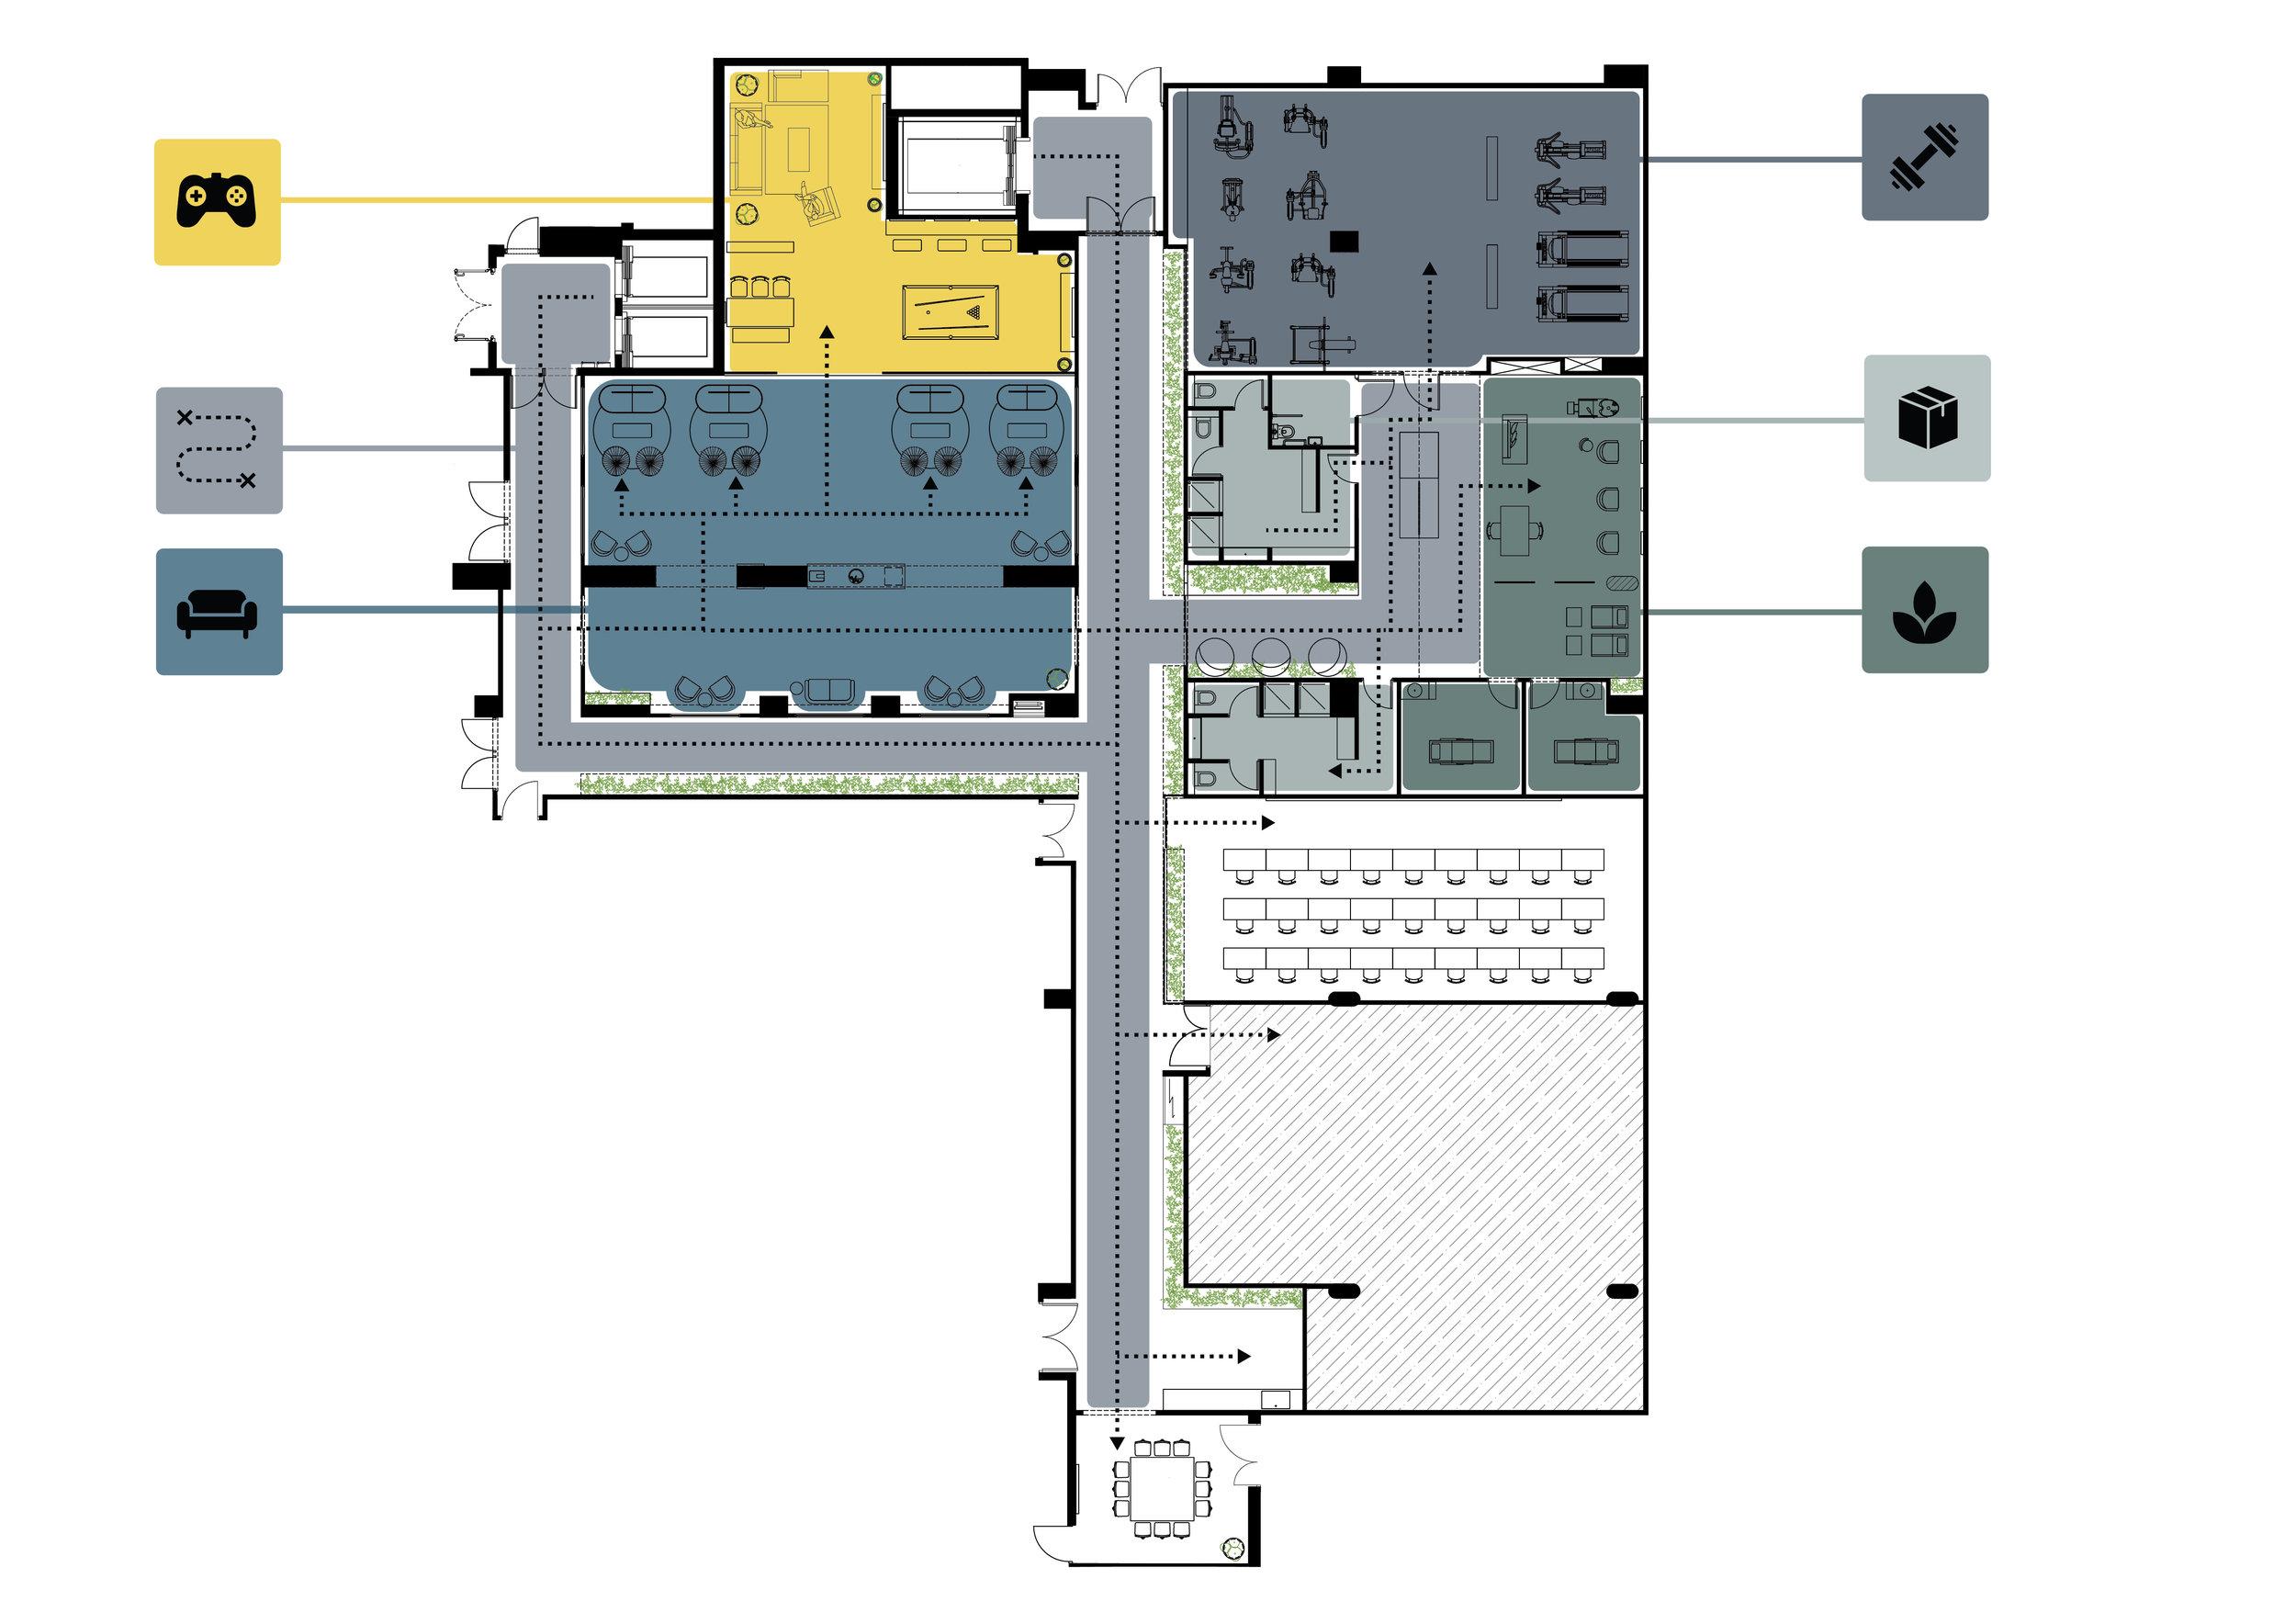 Wopa_diagram_Gila_Shemie_Zakay_Bre (10).jpg